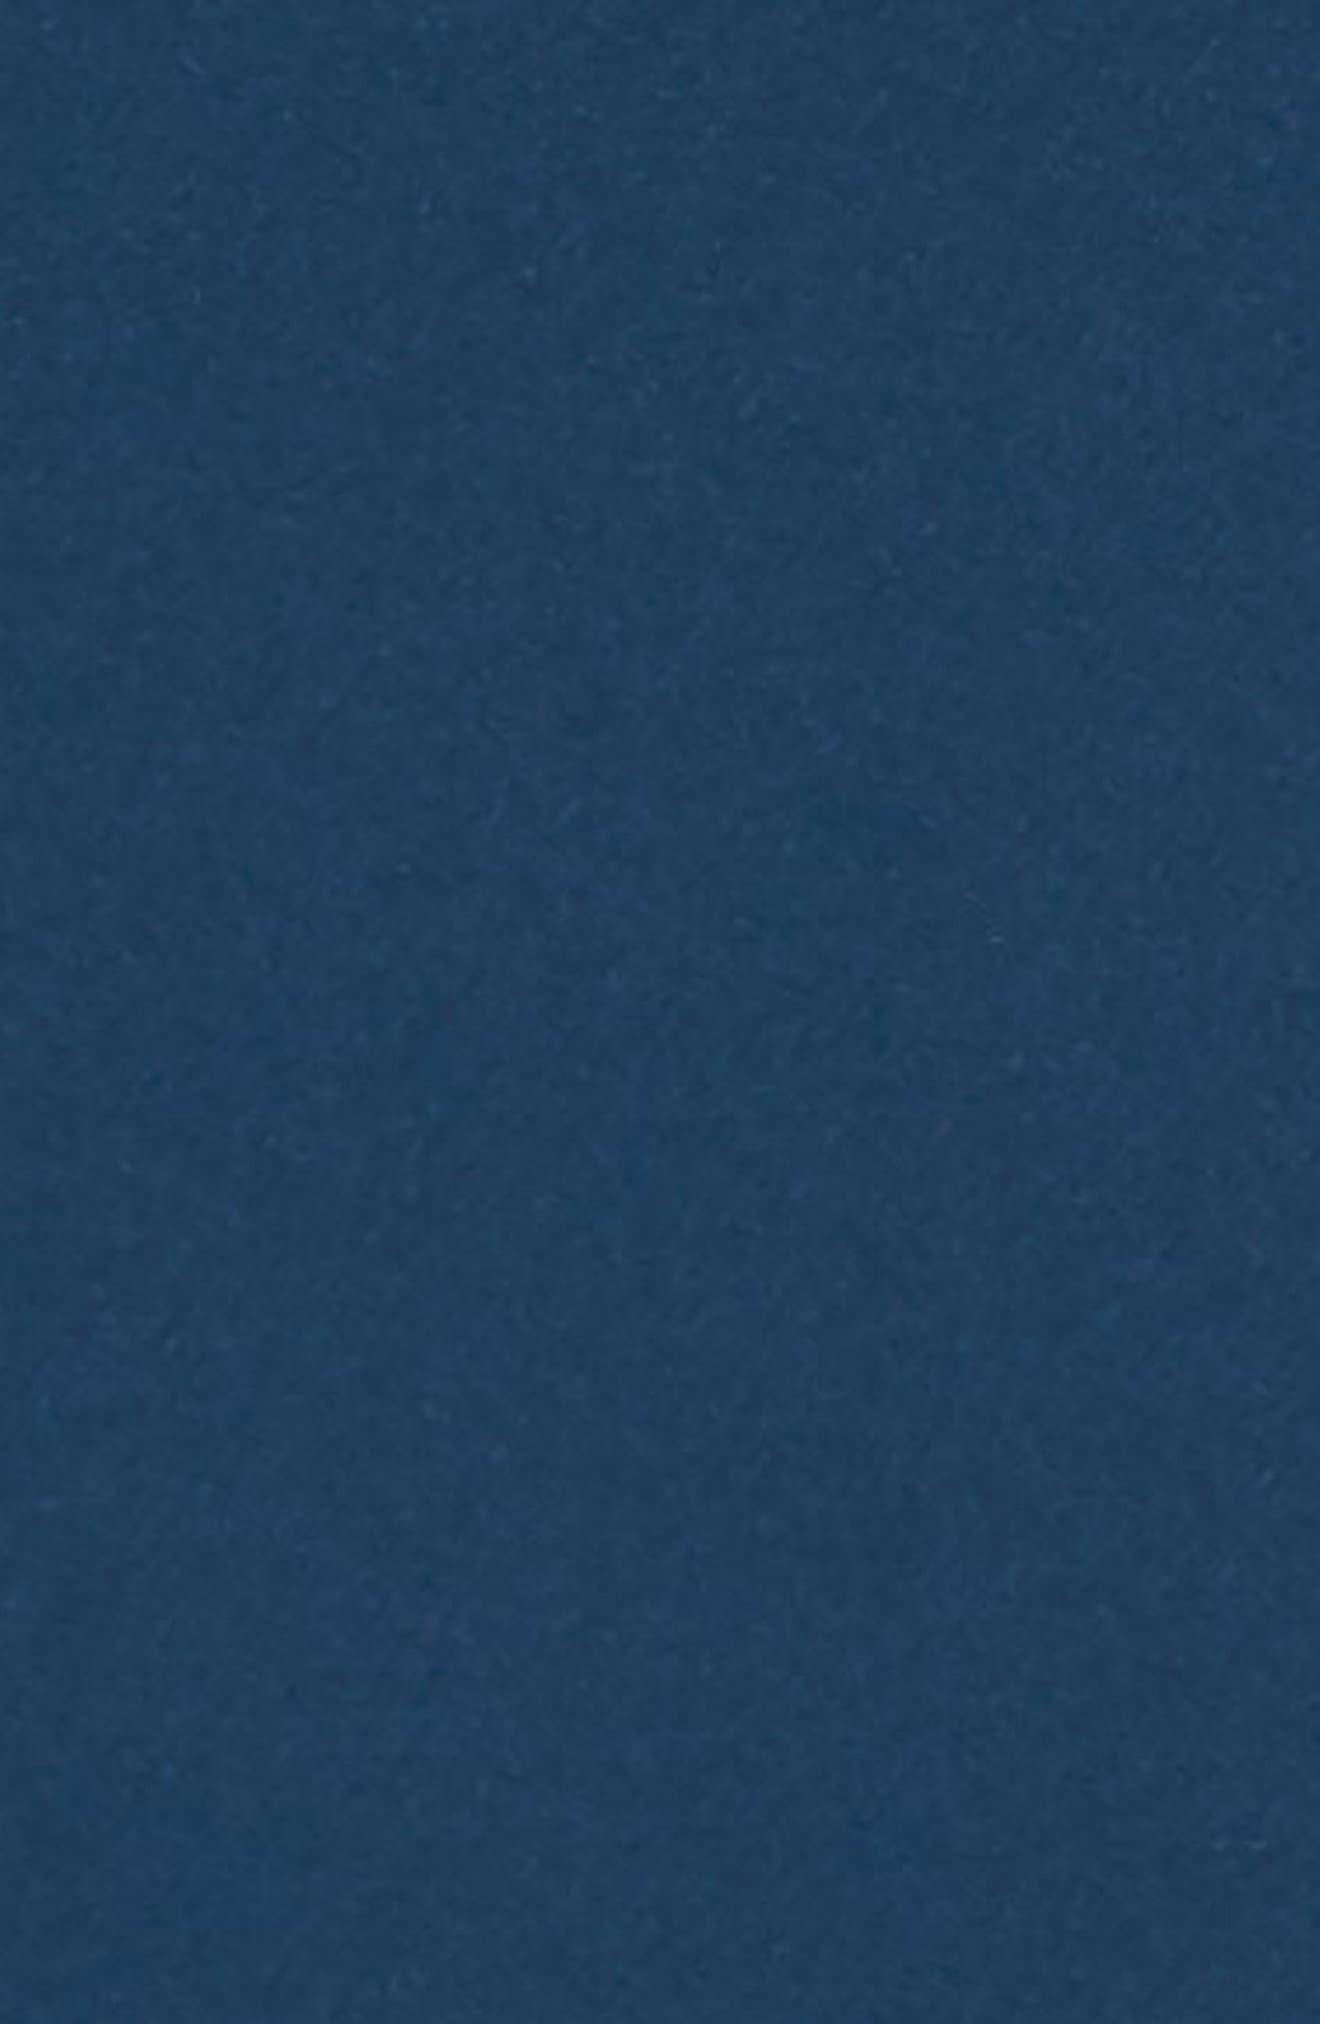 Ruffle Crepe A-Line Dress,                             Alternate thumbnail 6, color,                             400